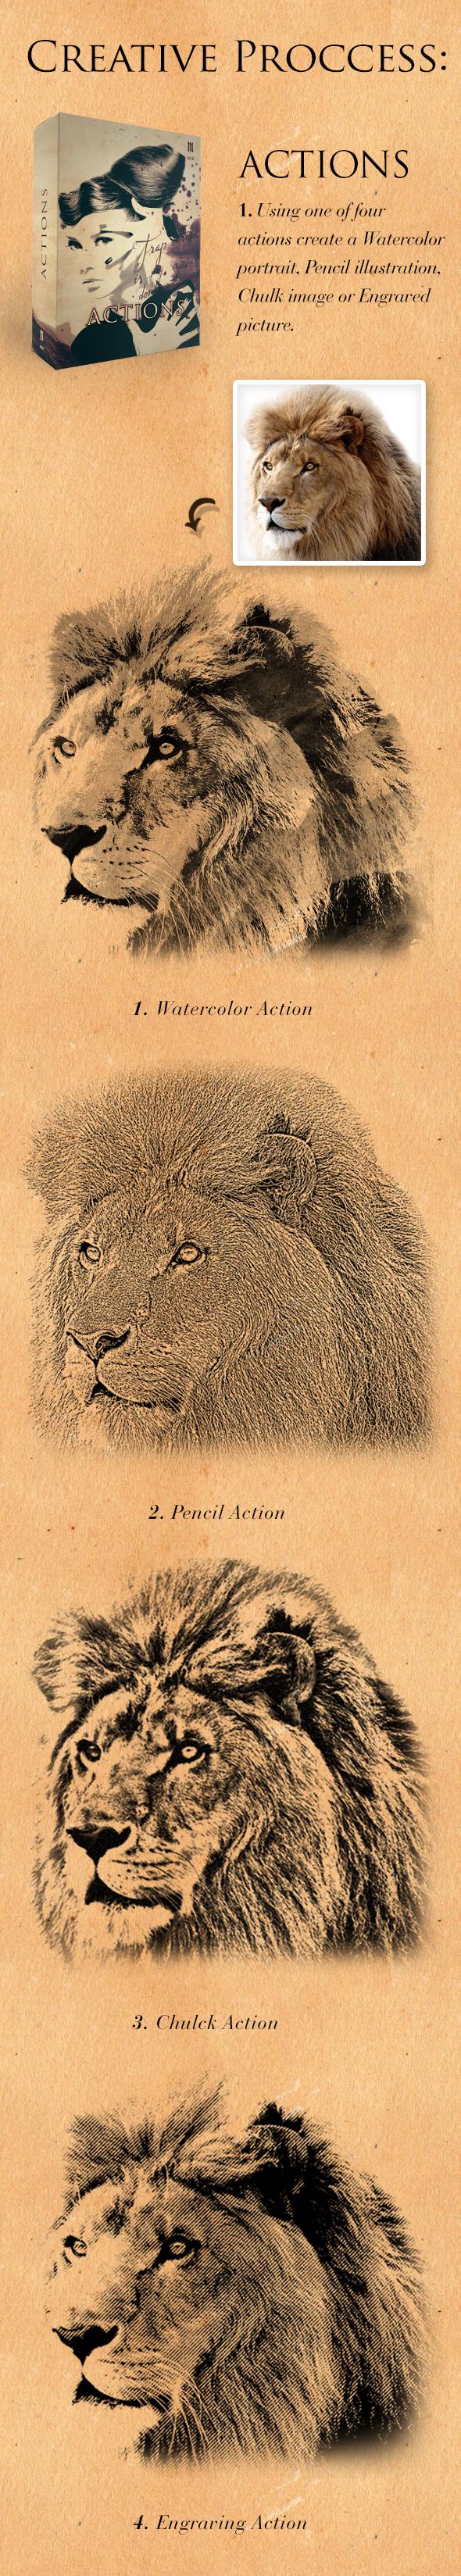 Watercolour Art Bundle example image 7